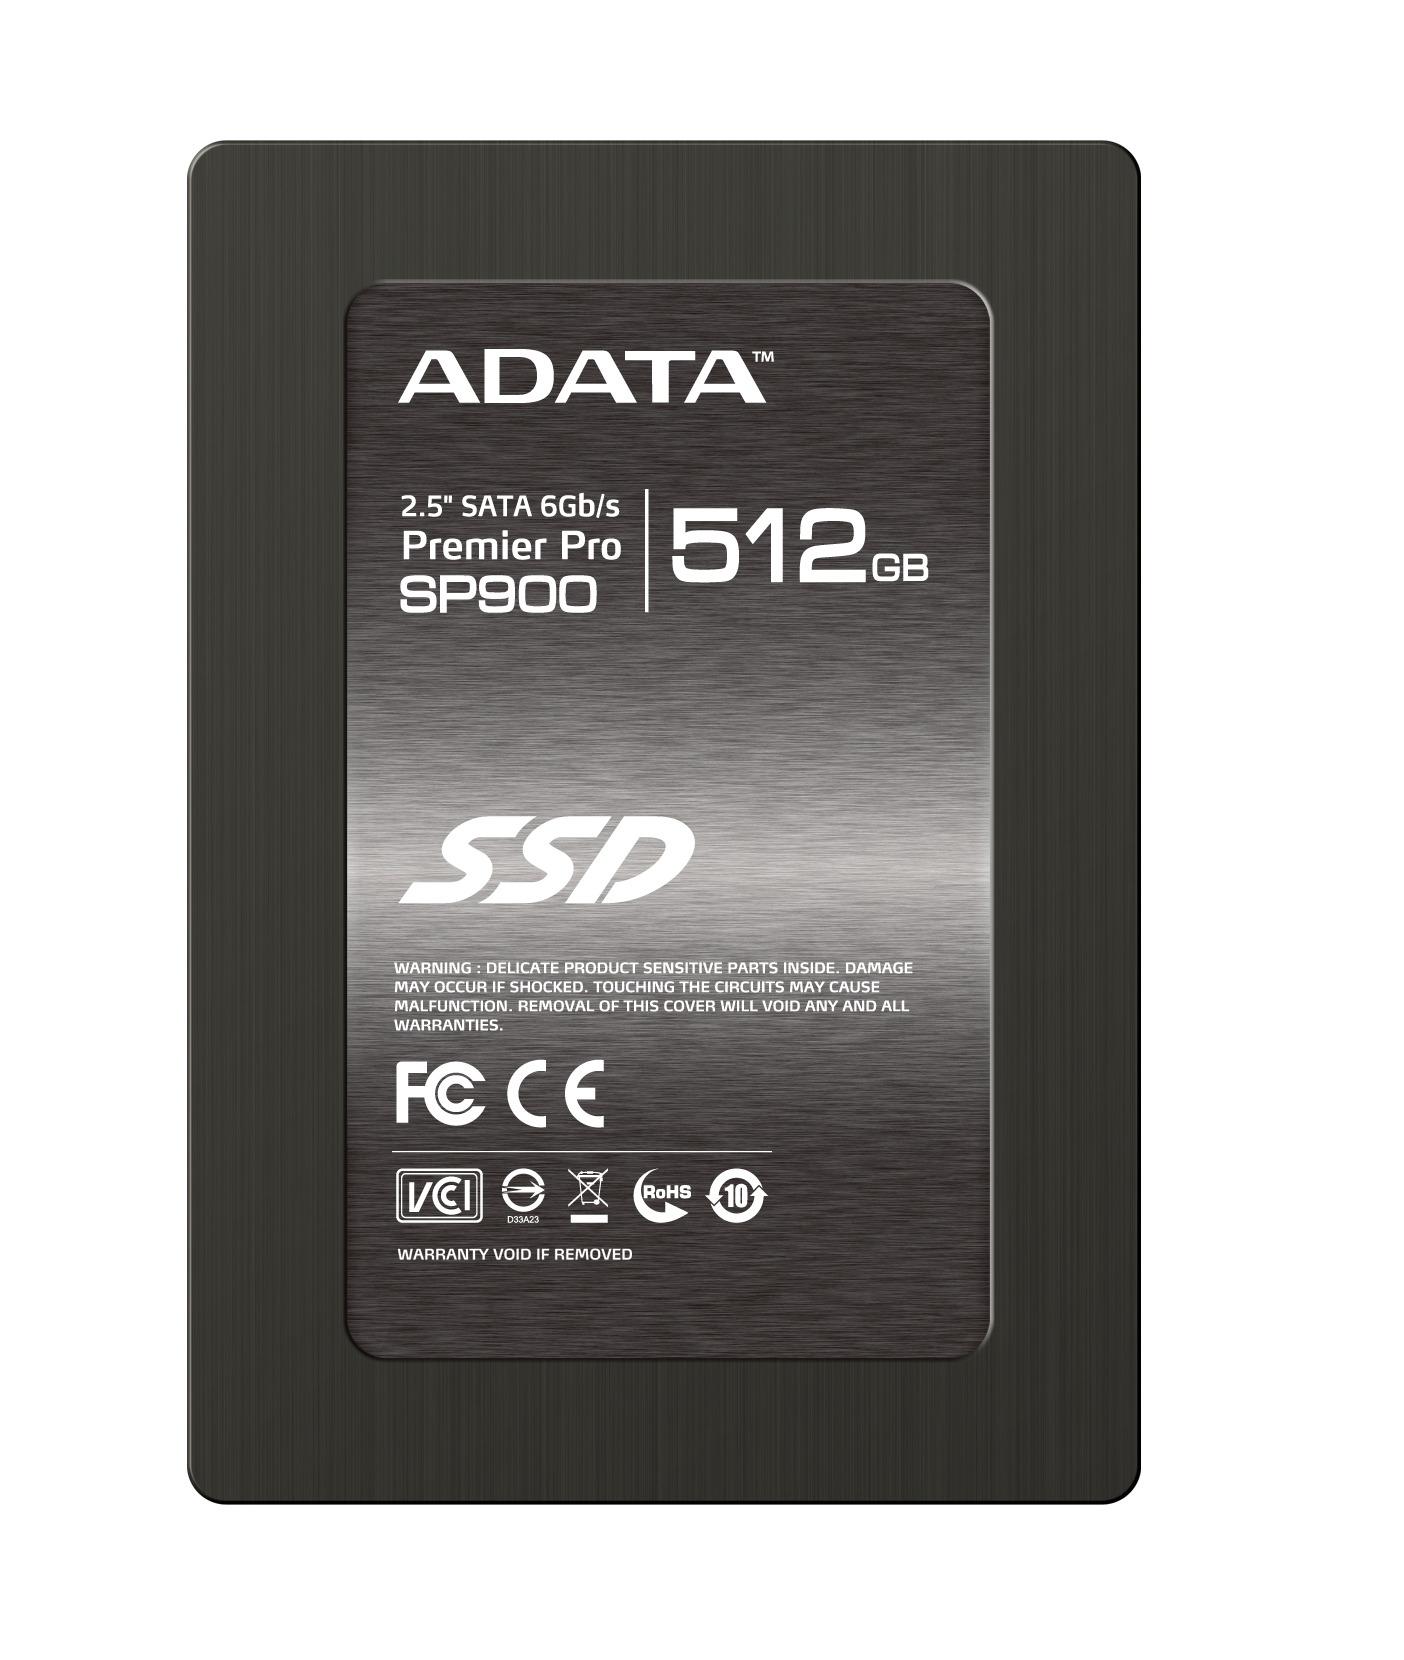 ADATA SSD SP900 Premier Pro 512GB 2.5